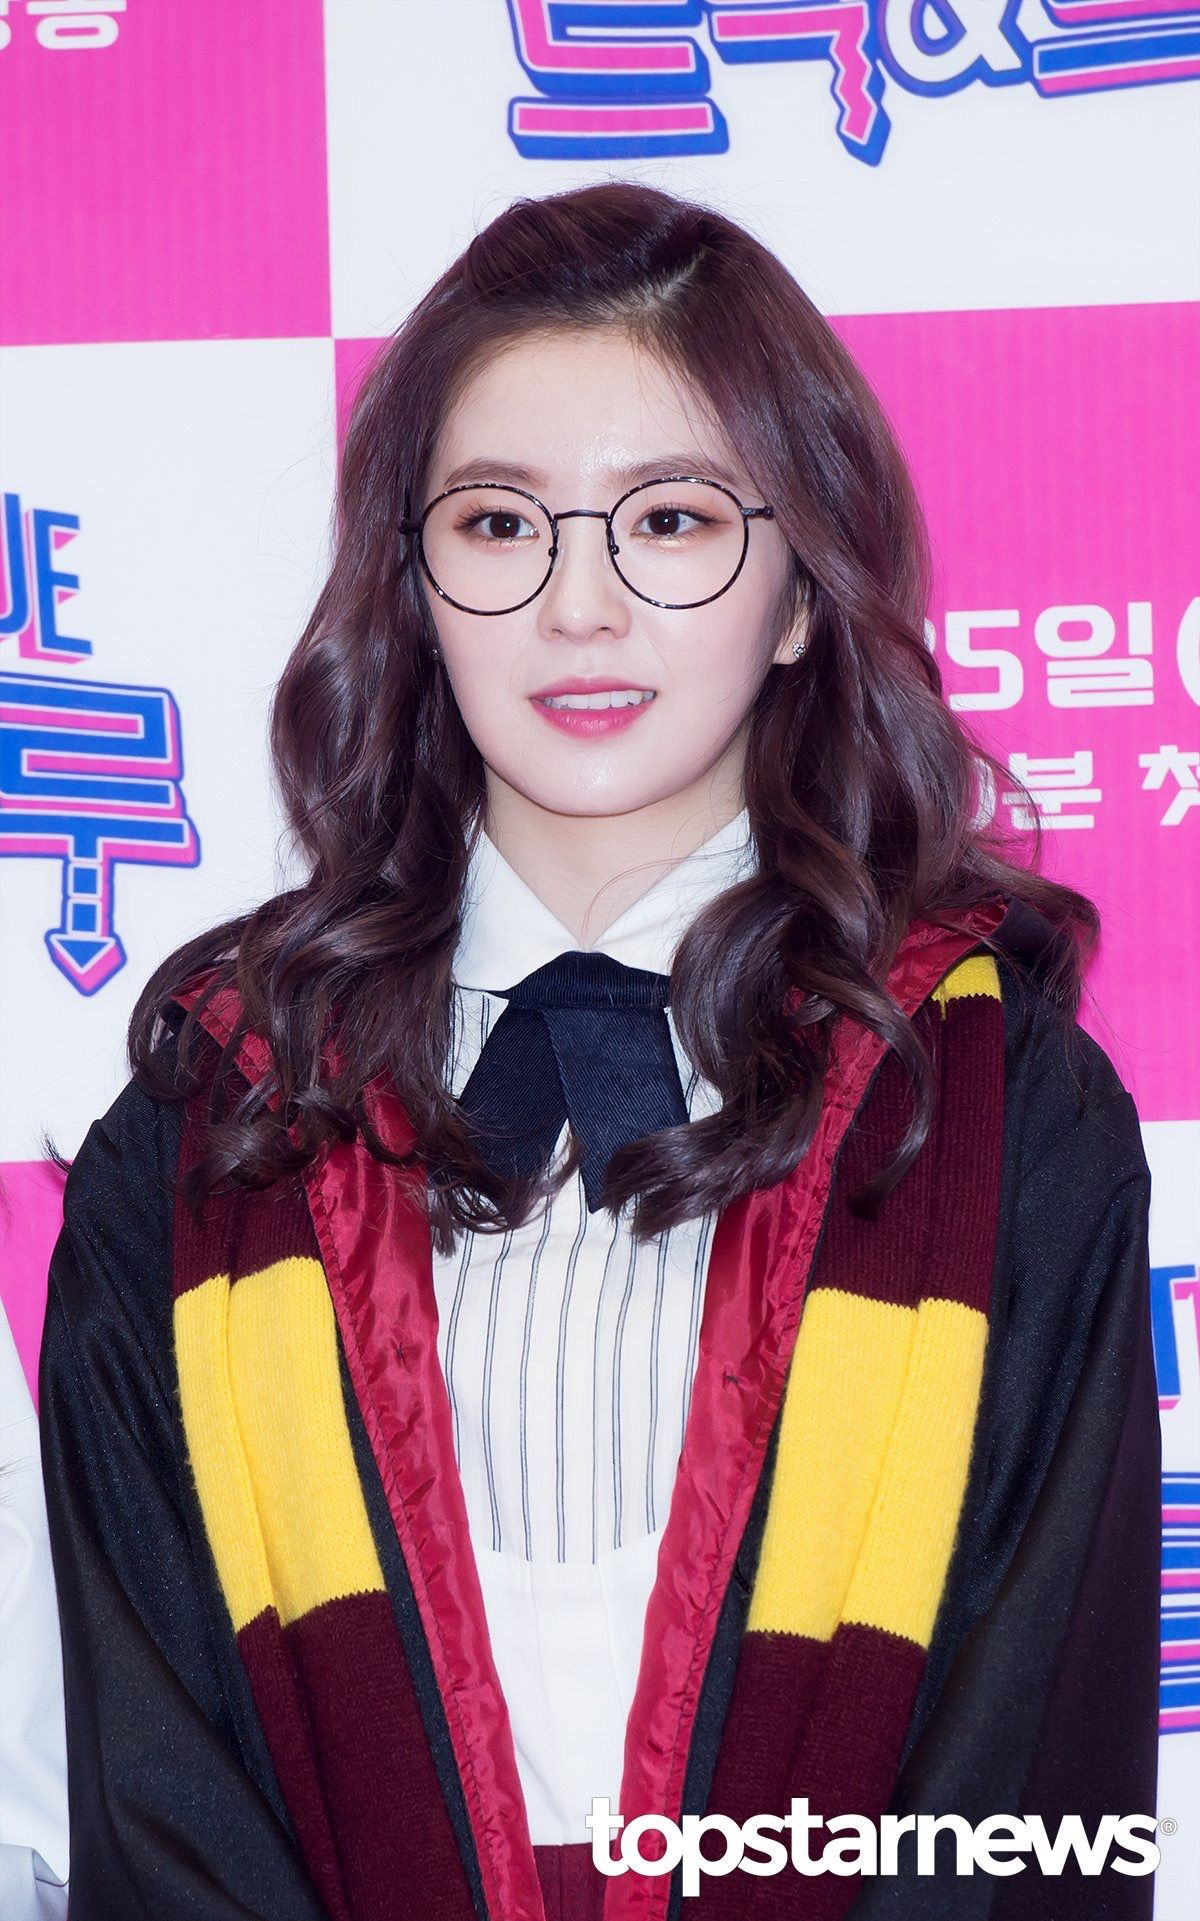 Gryffindor Irene